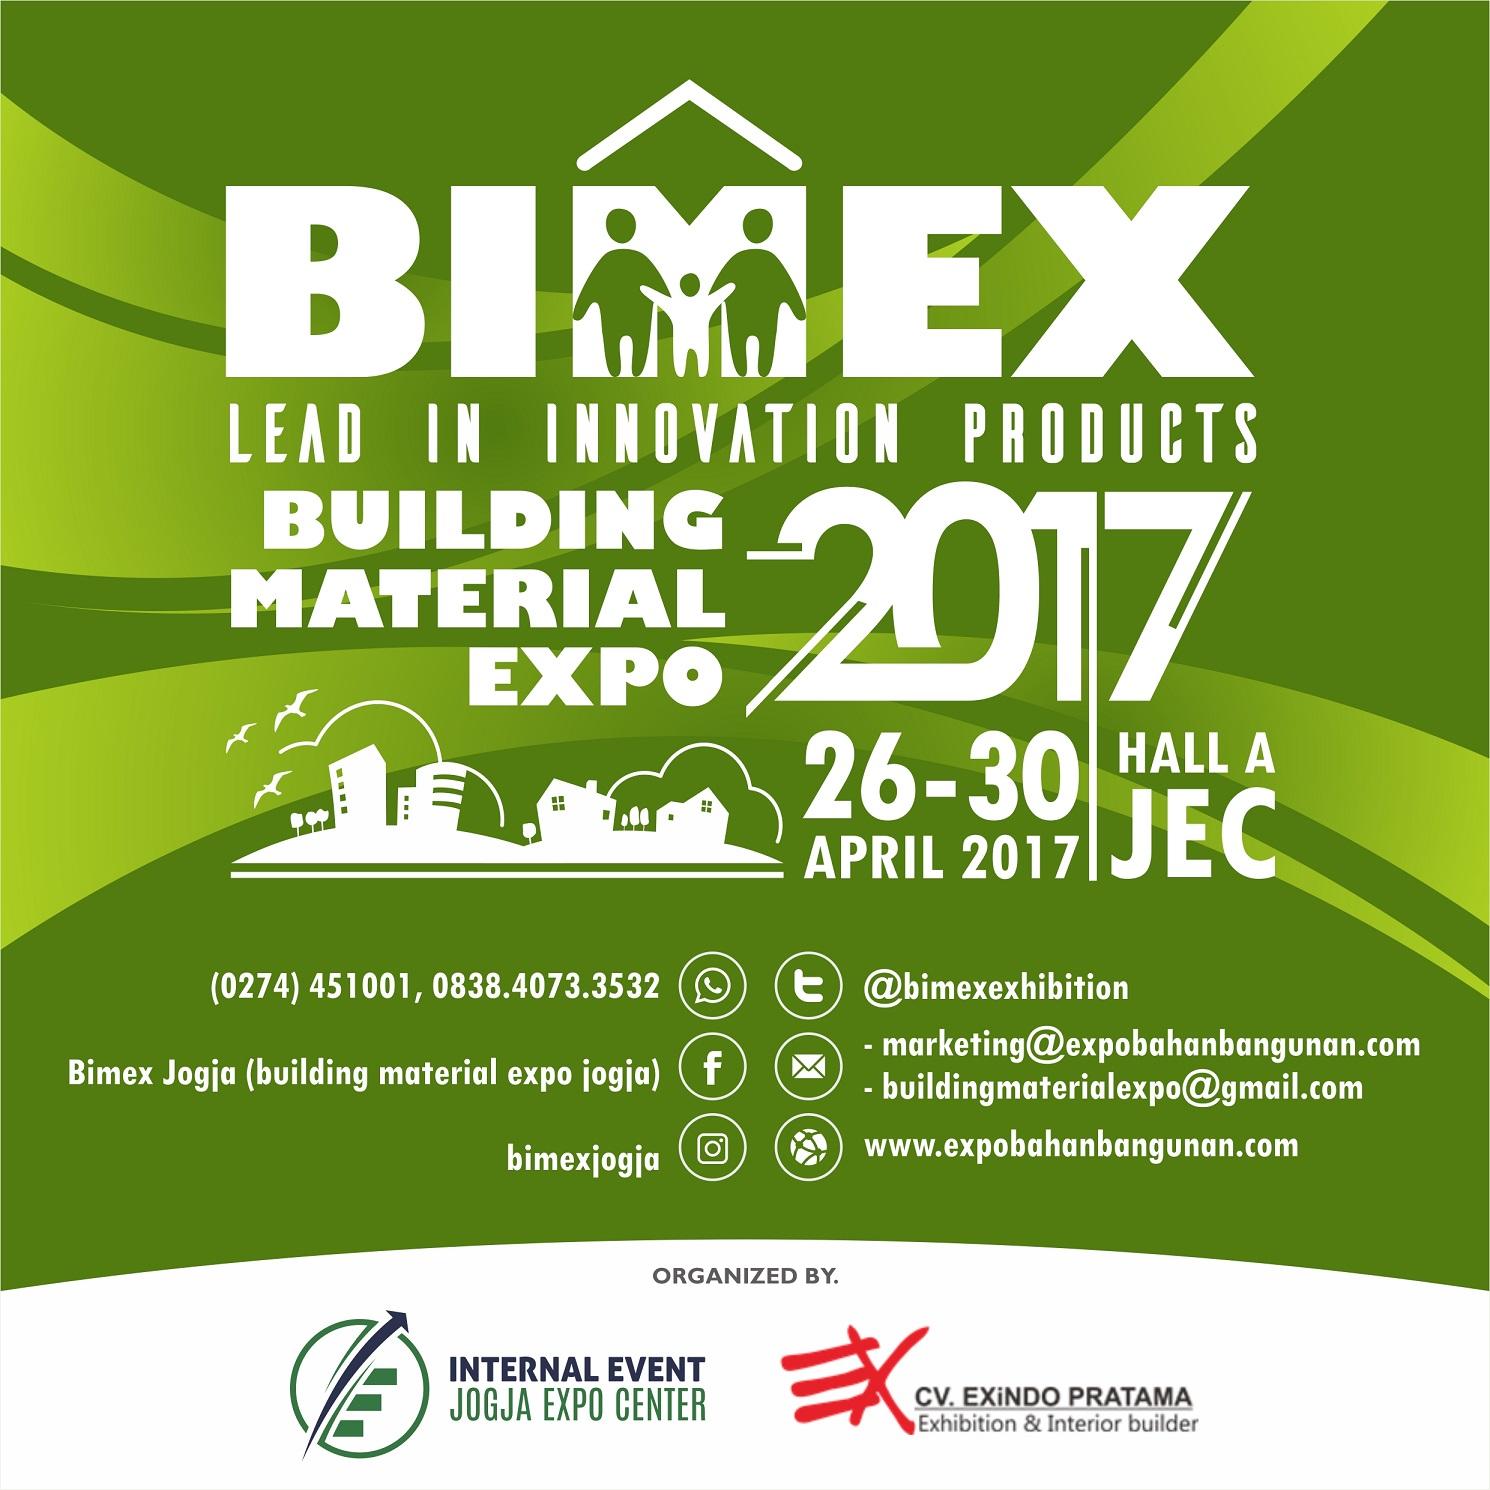 BIMEX, Expo Bahan Bangunan 2017